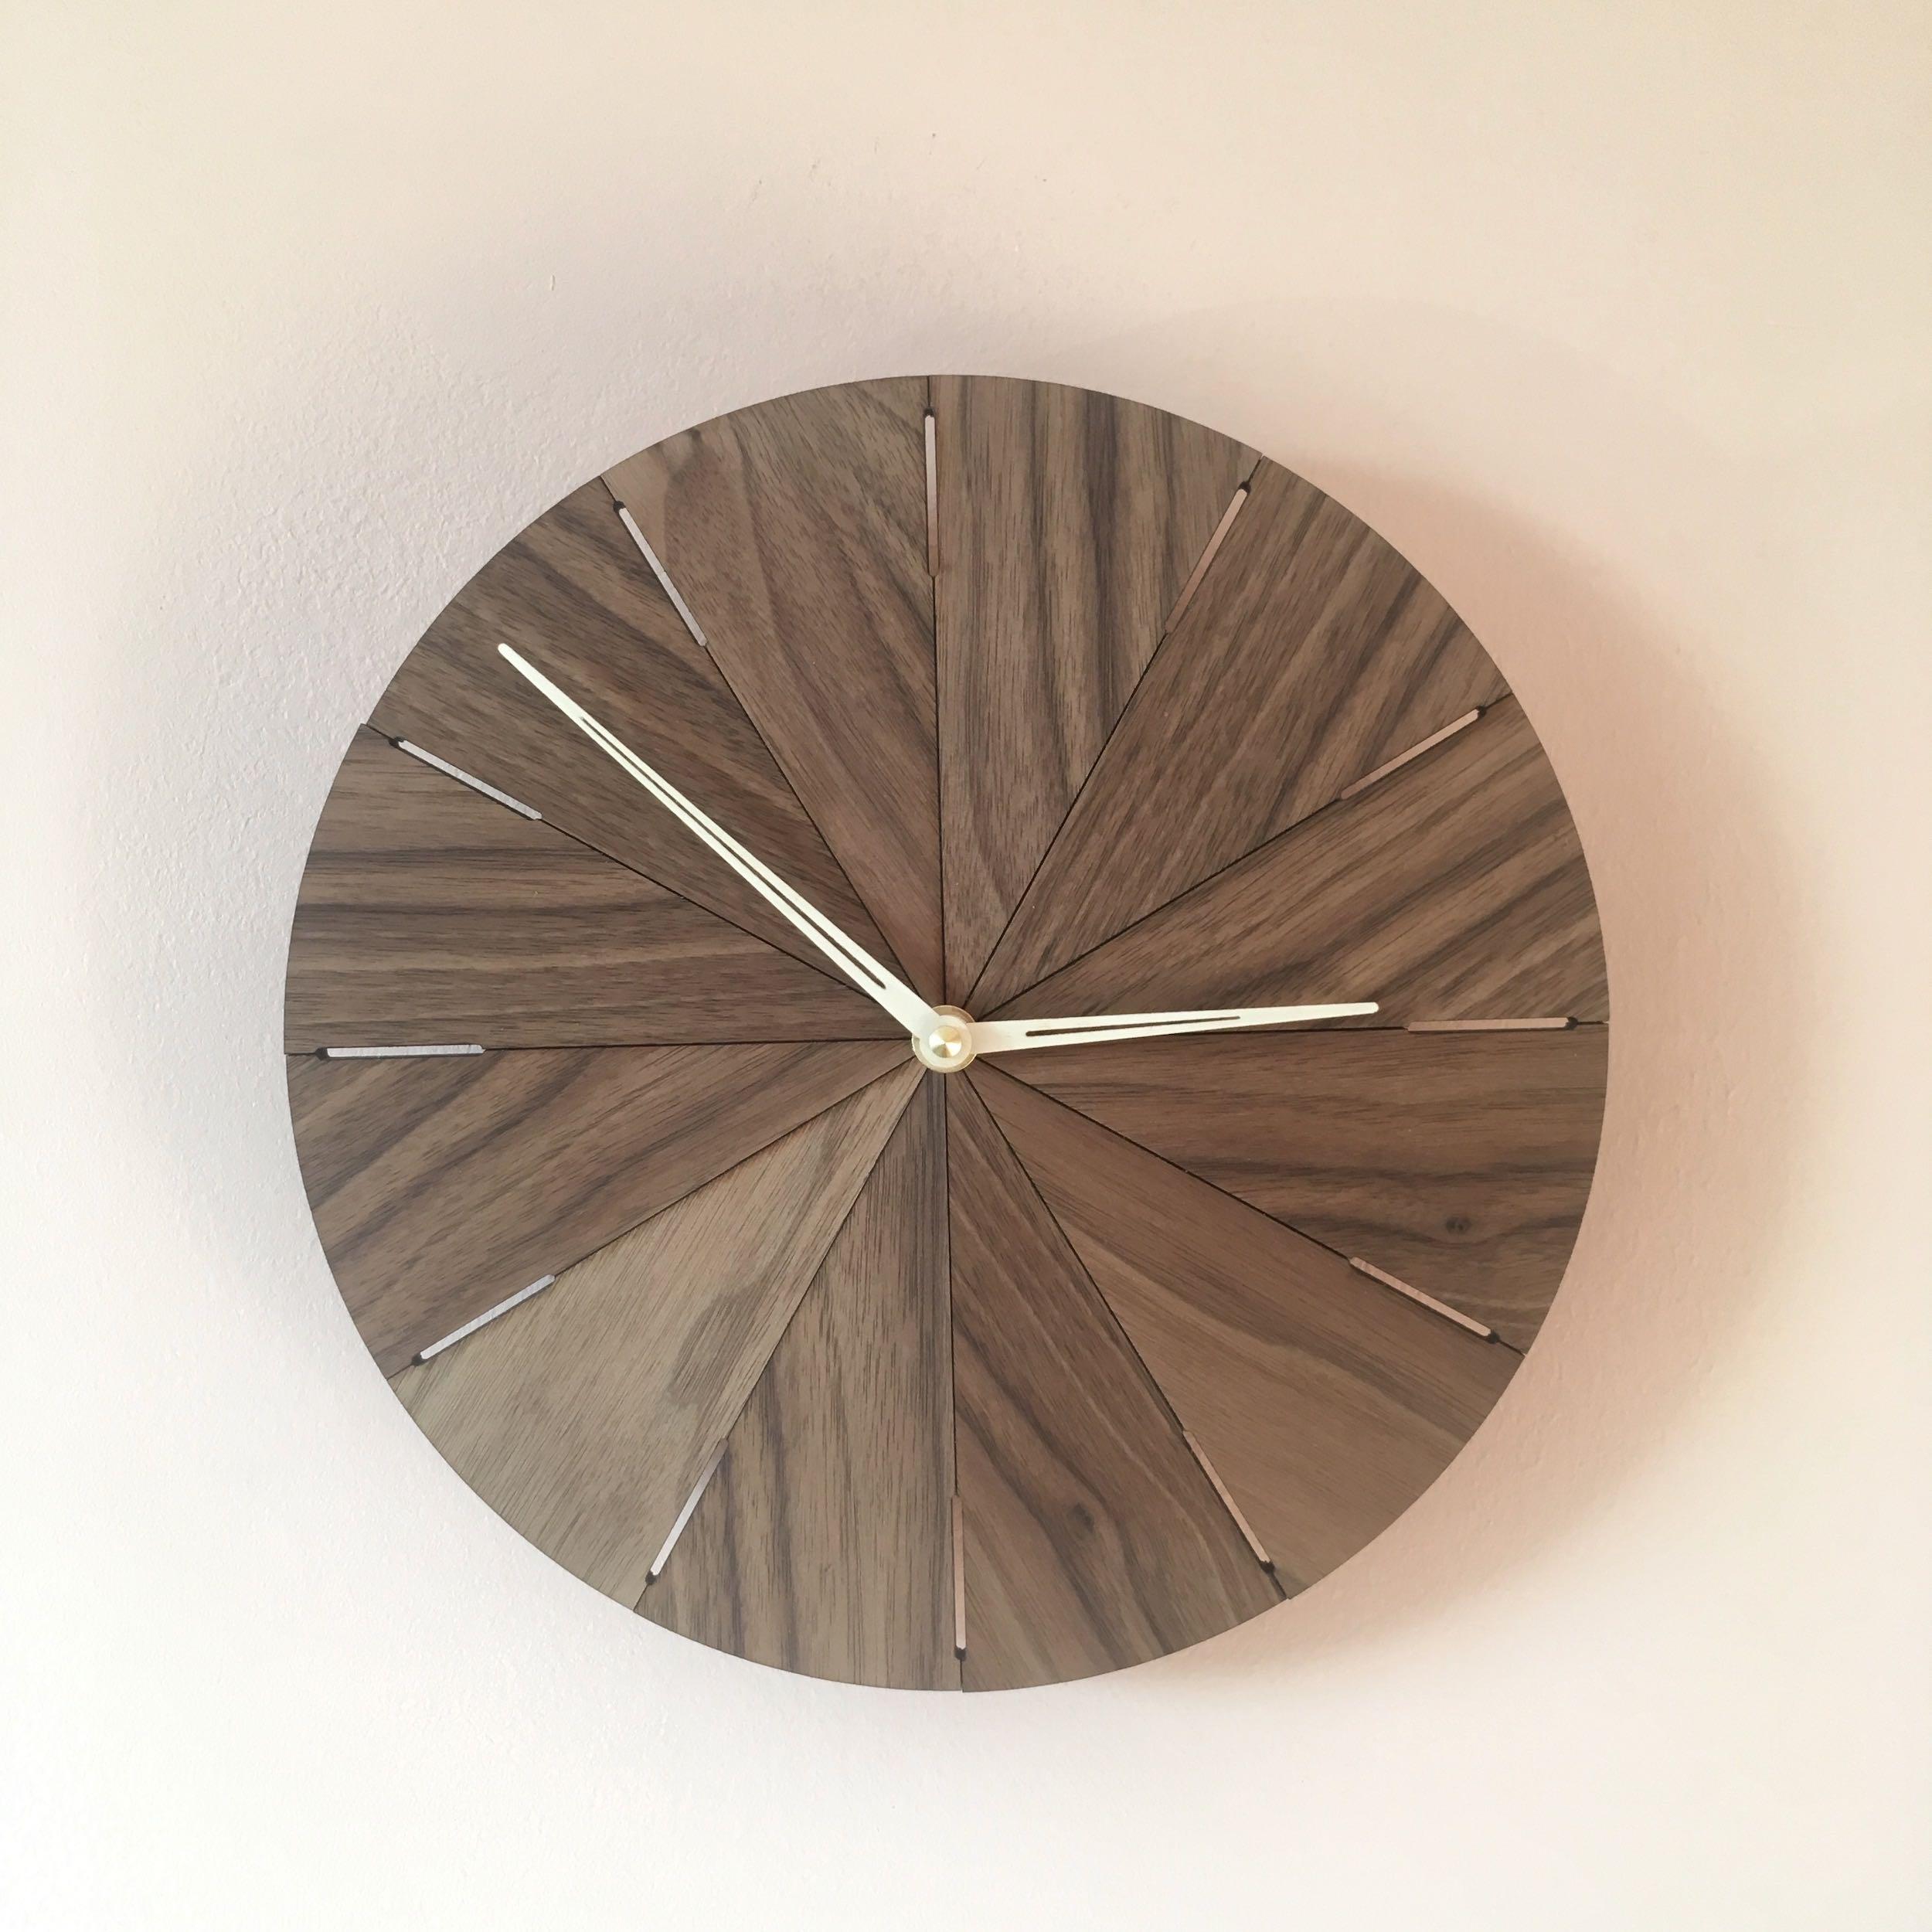 Zegar drewniany N˚ 10 25 cm American Walnut